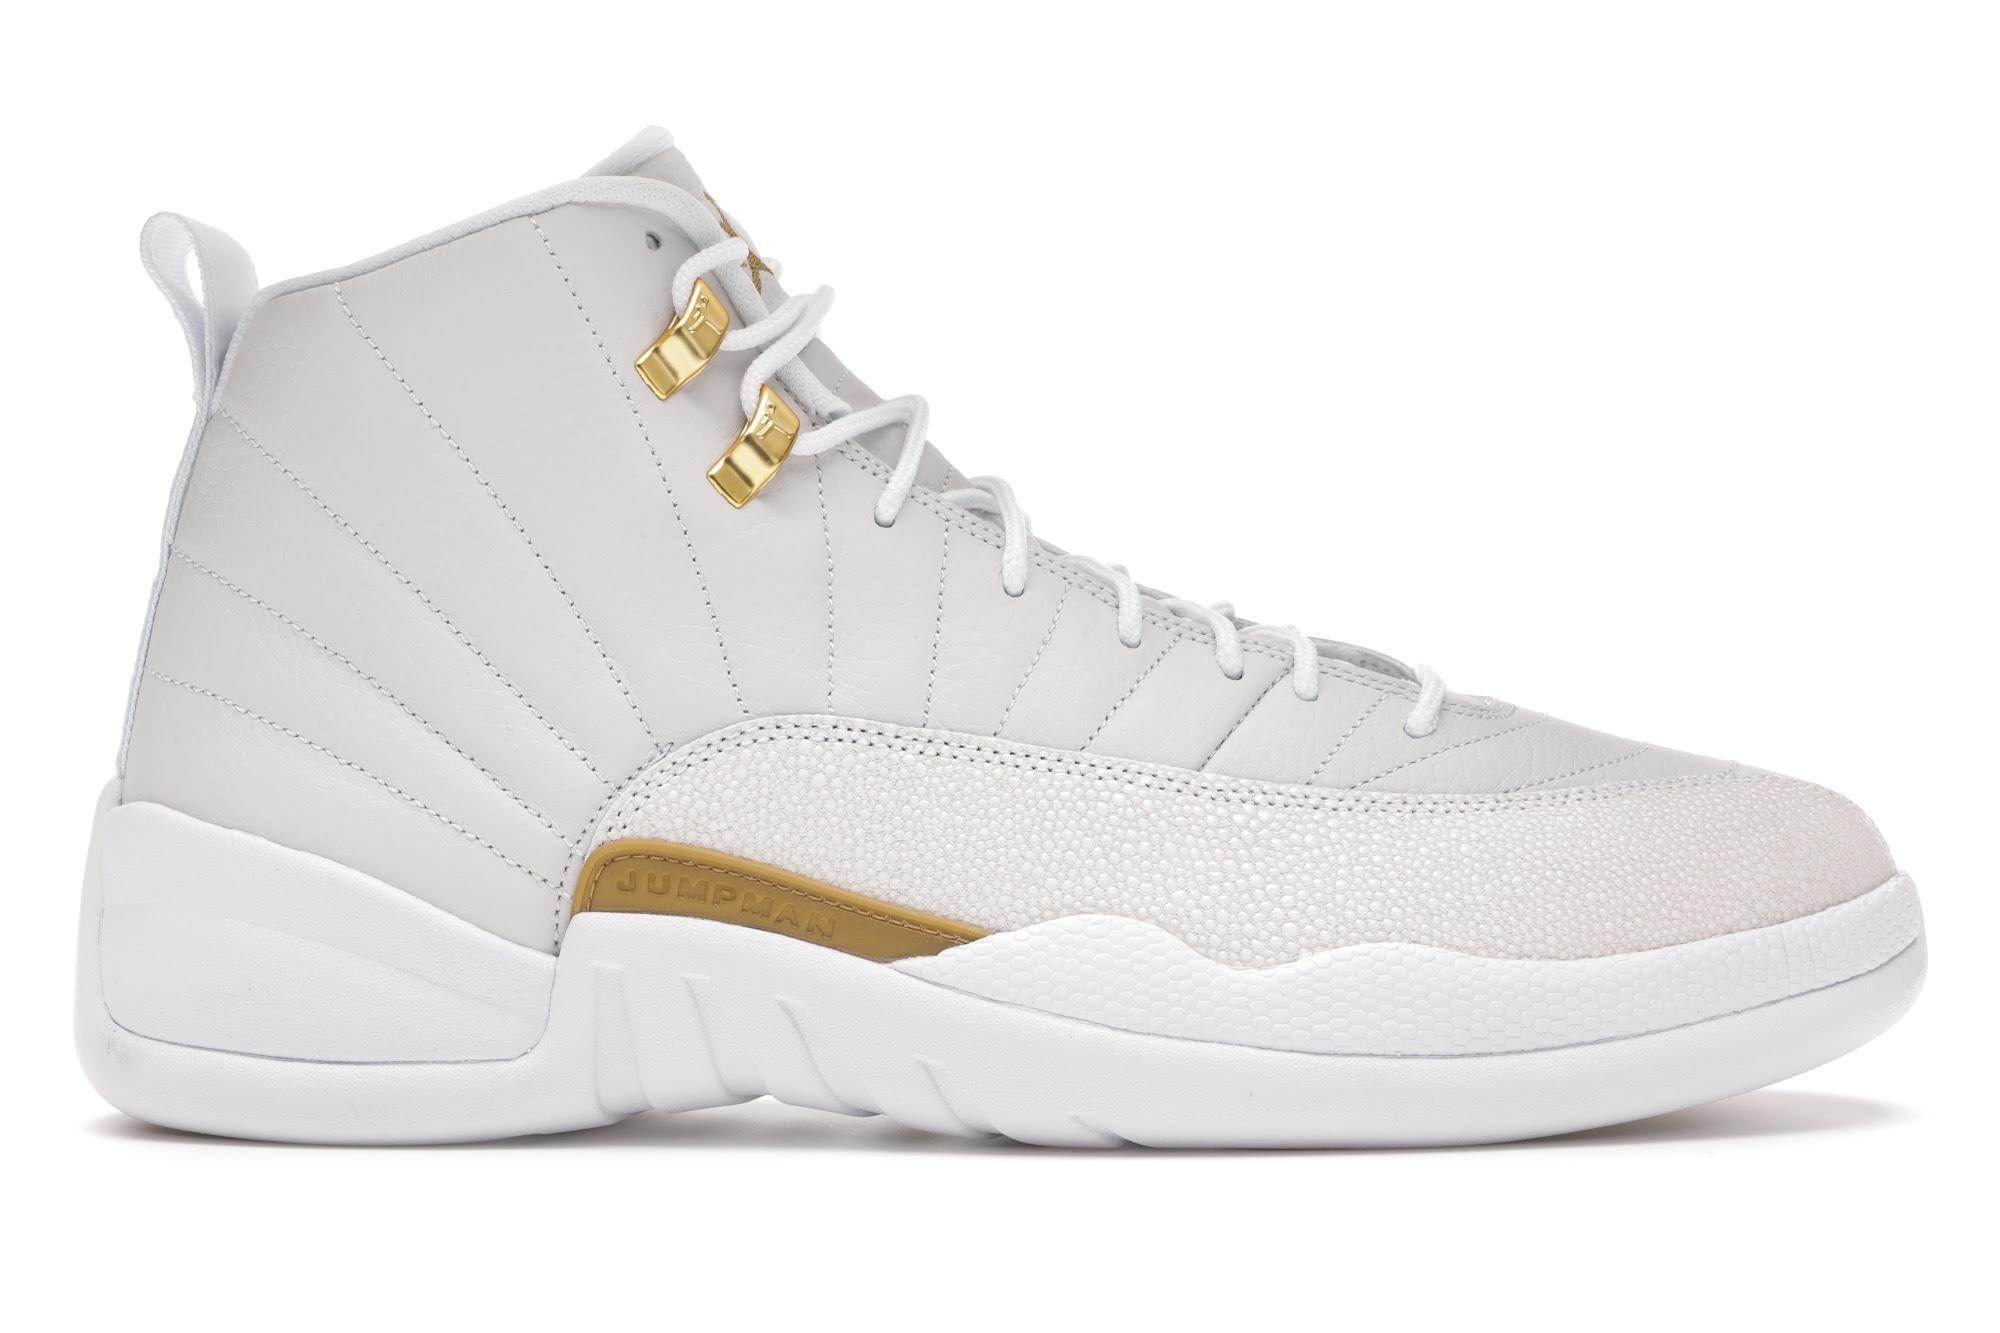 Jordan 12 Retro OVO White